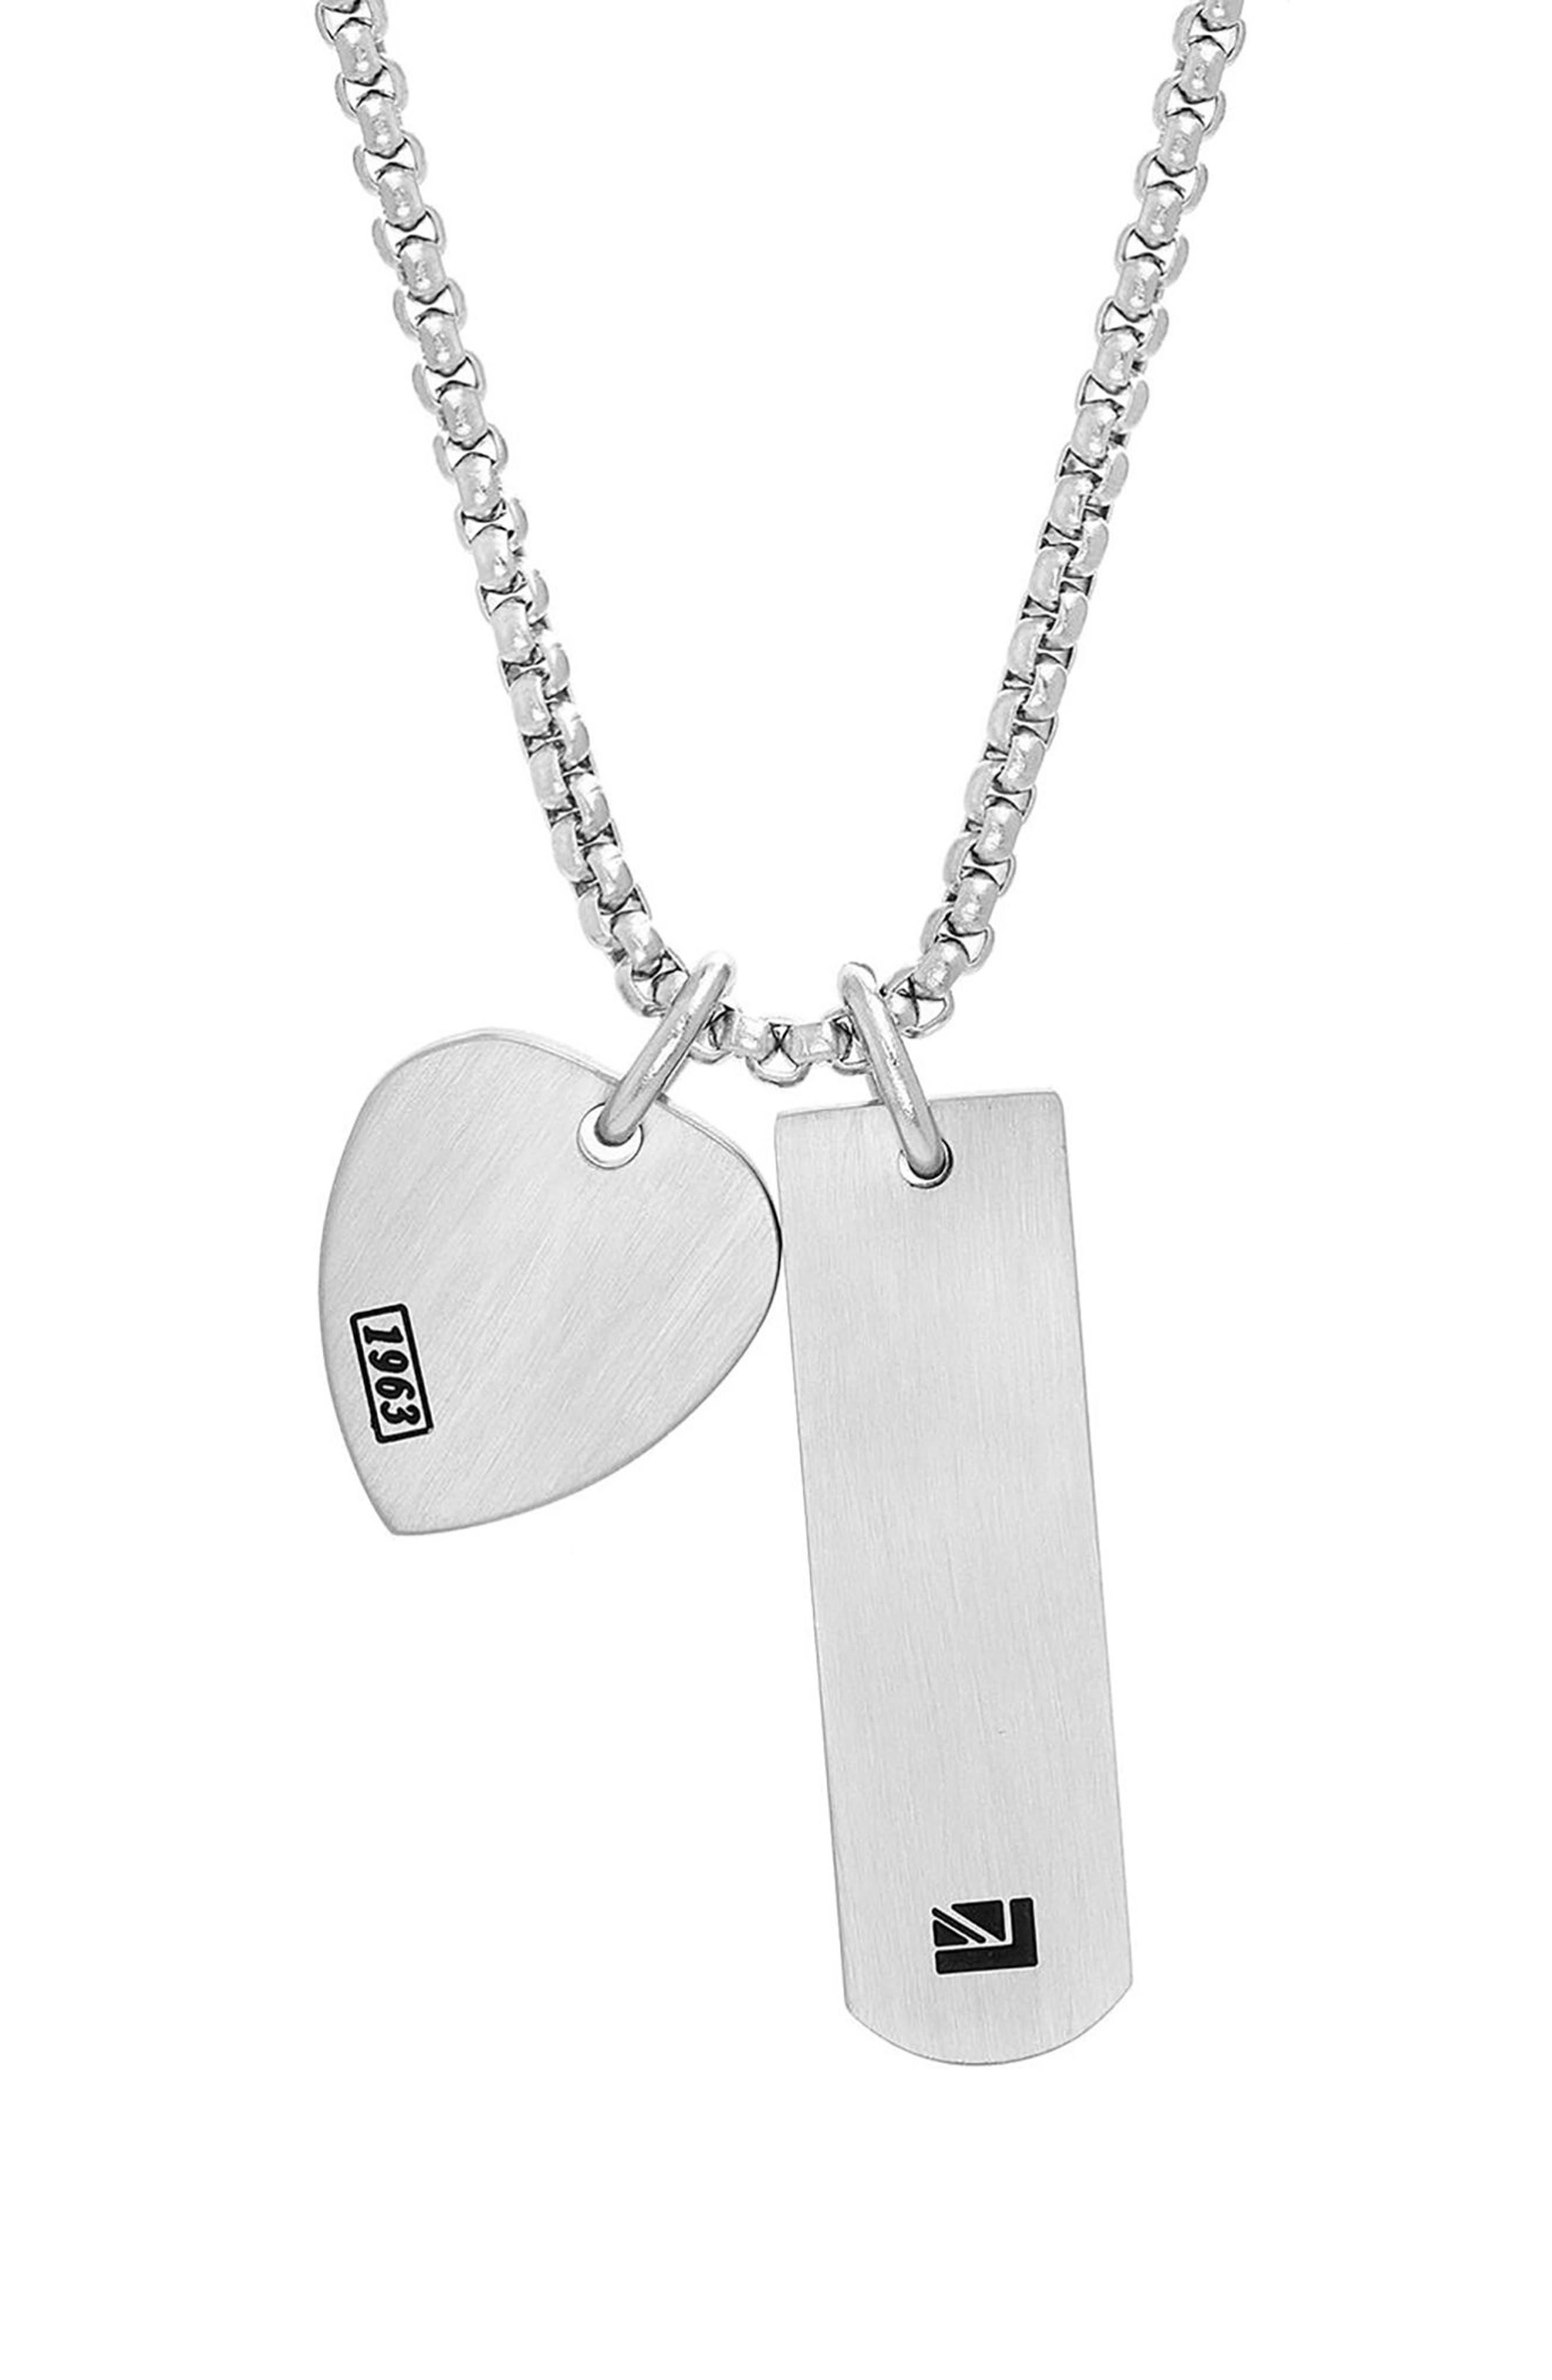 Teardrop Pendant Necklace,                         Main,                         color, Silver